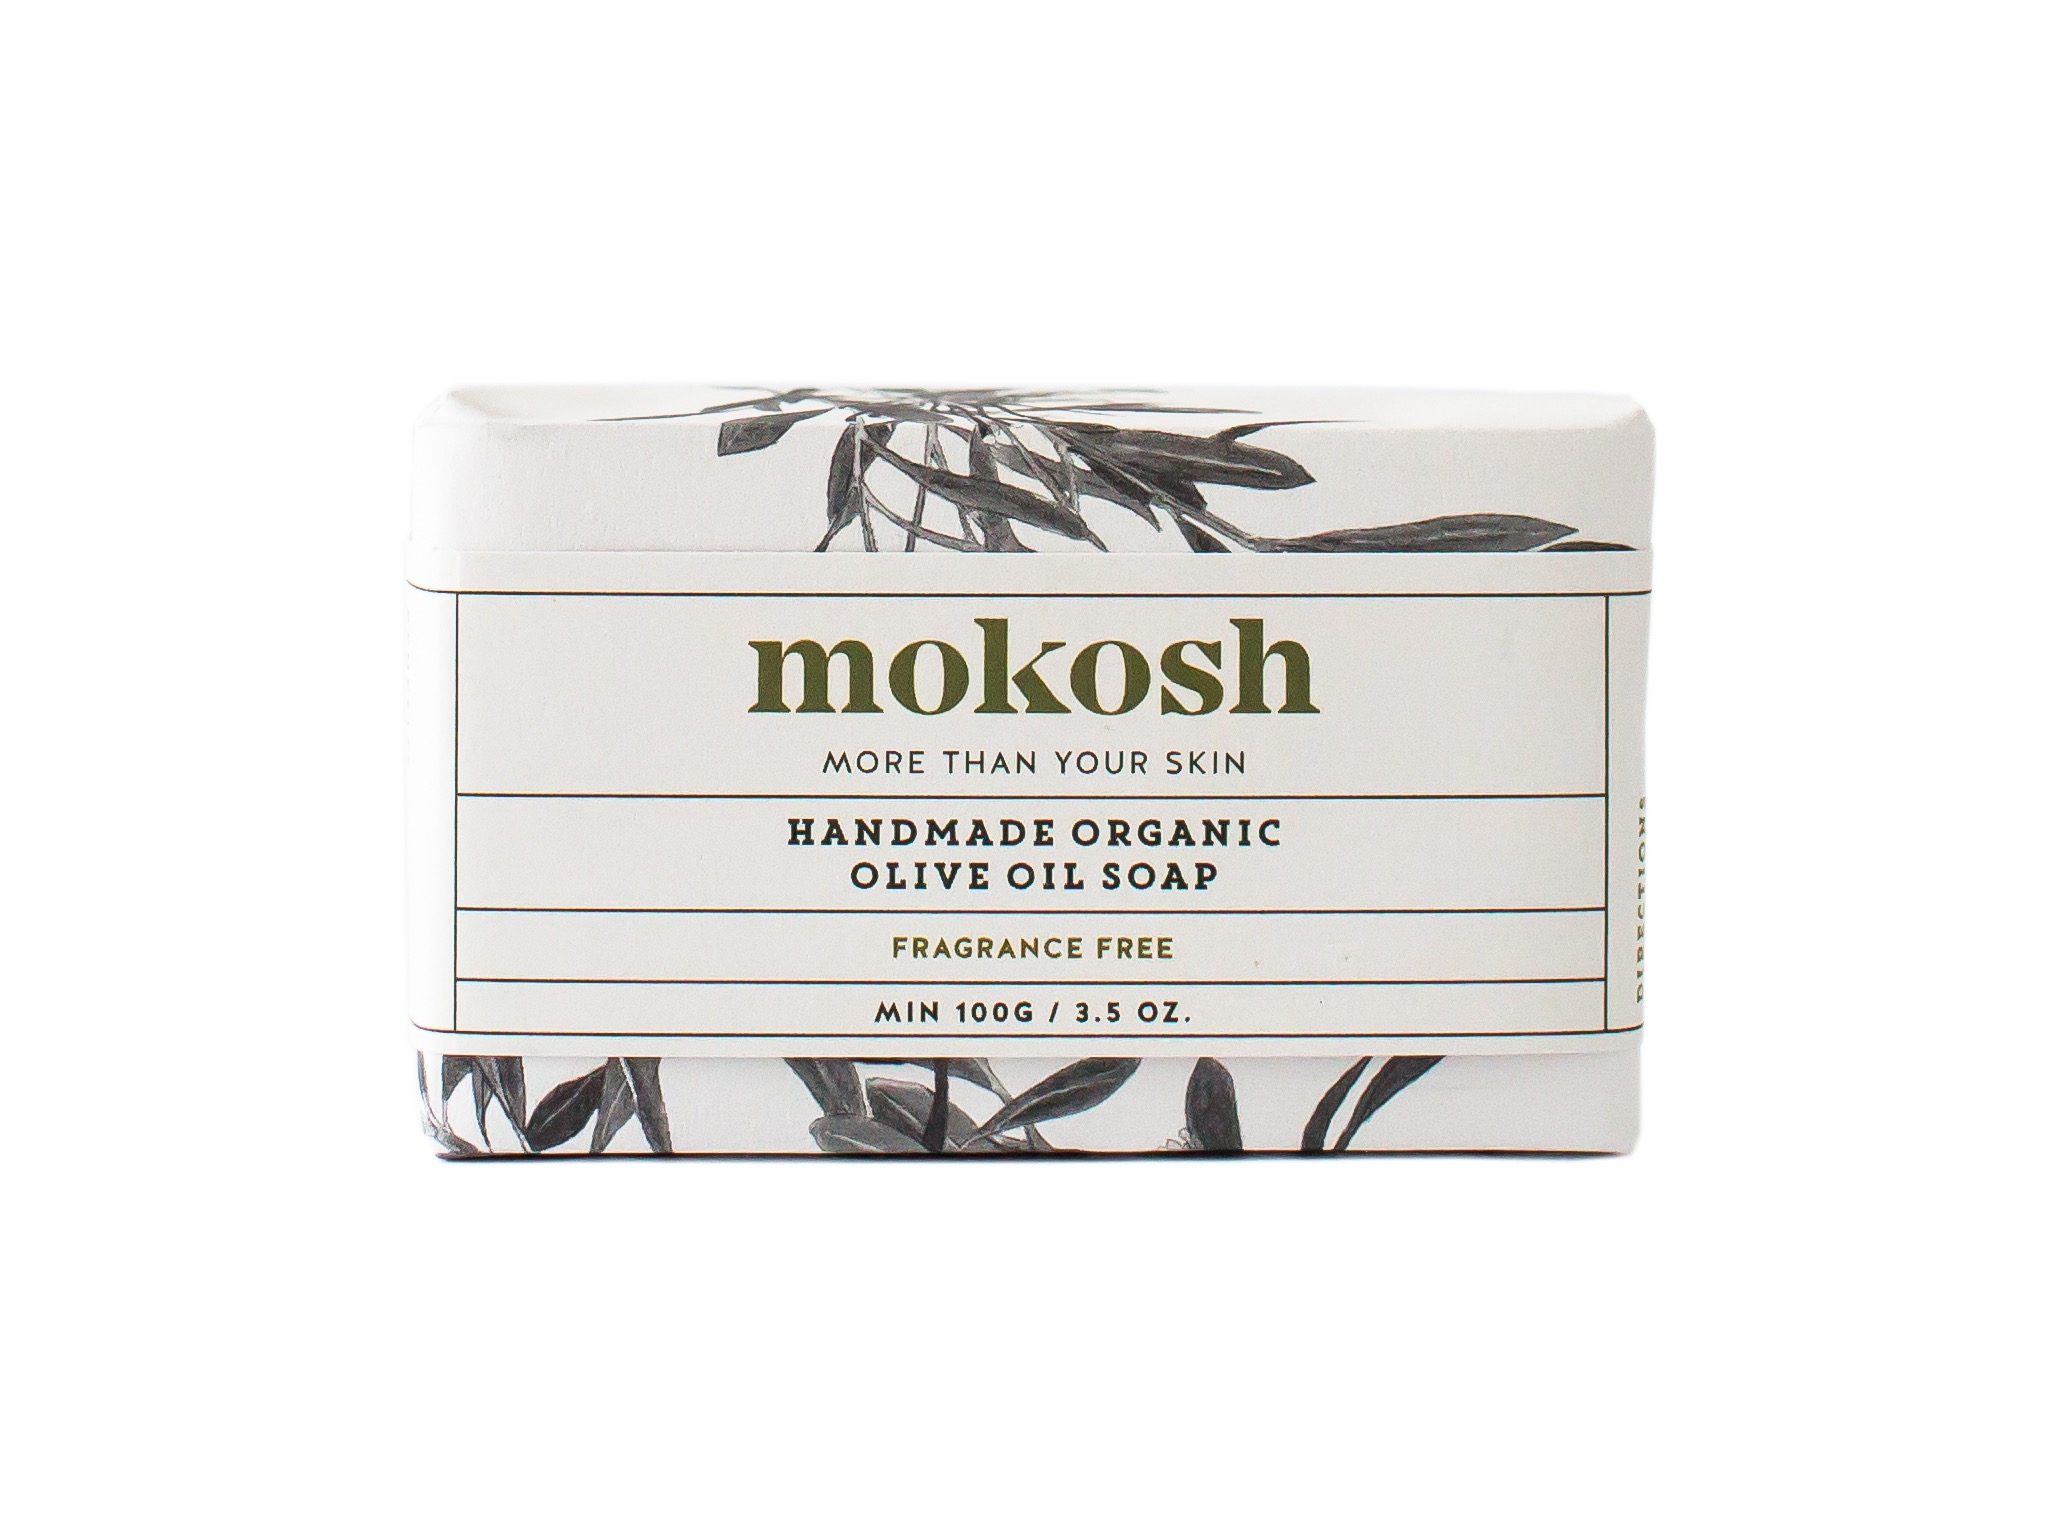 Mokosh Olive Oil Soap